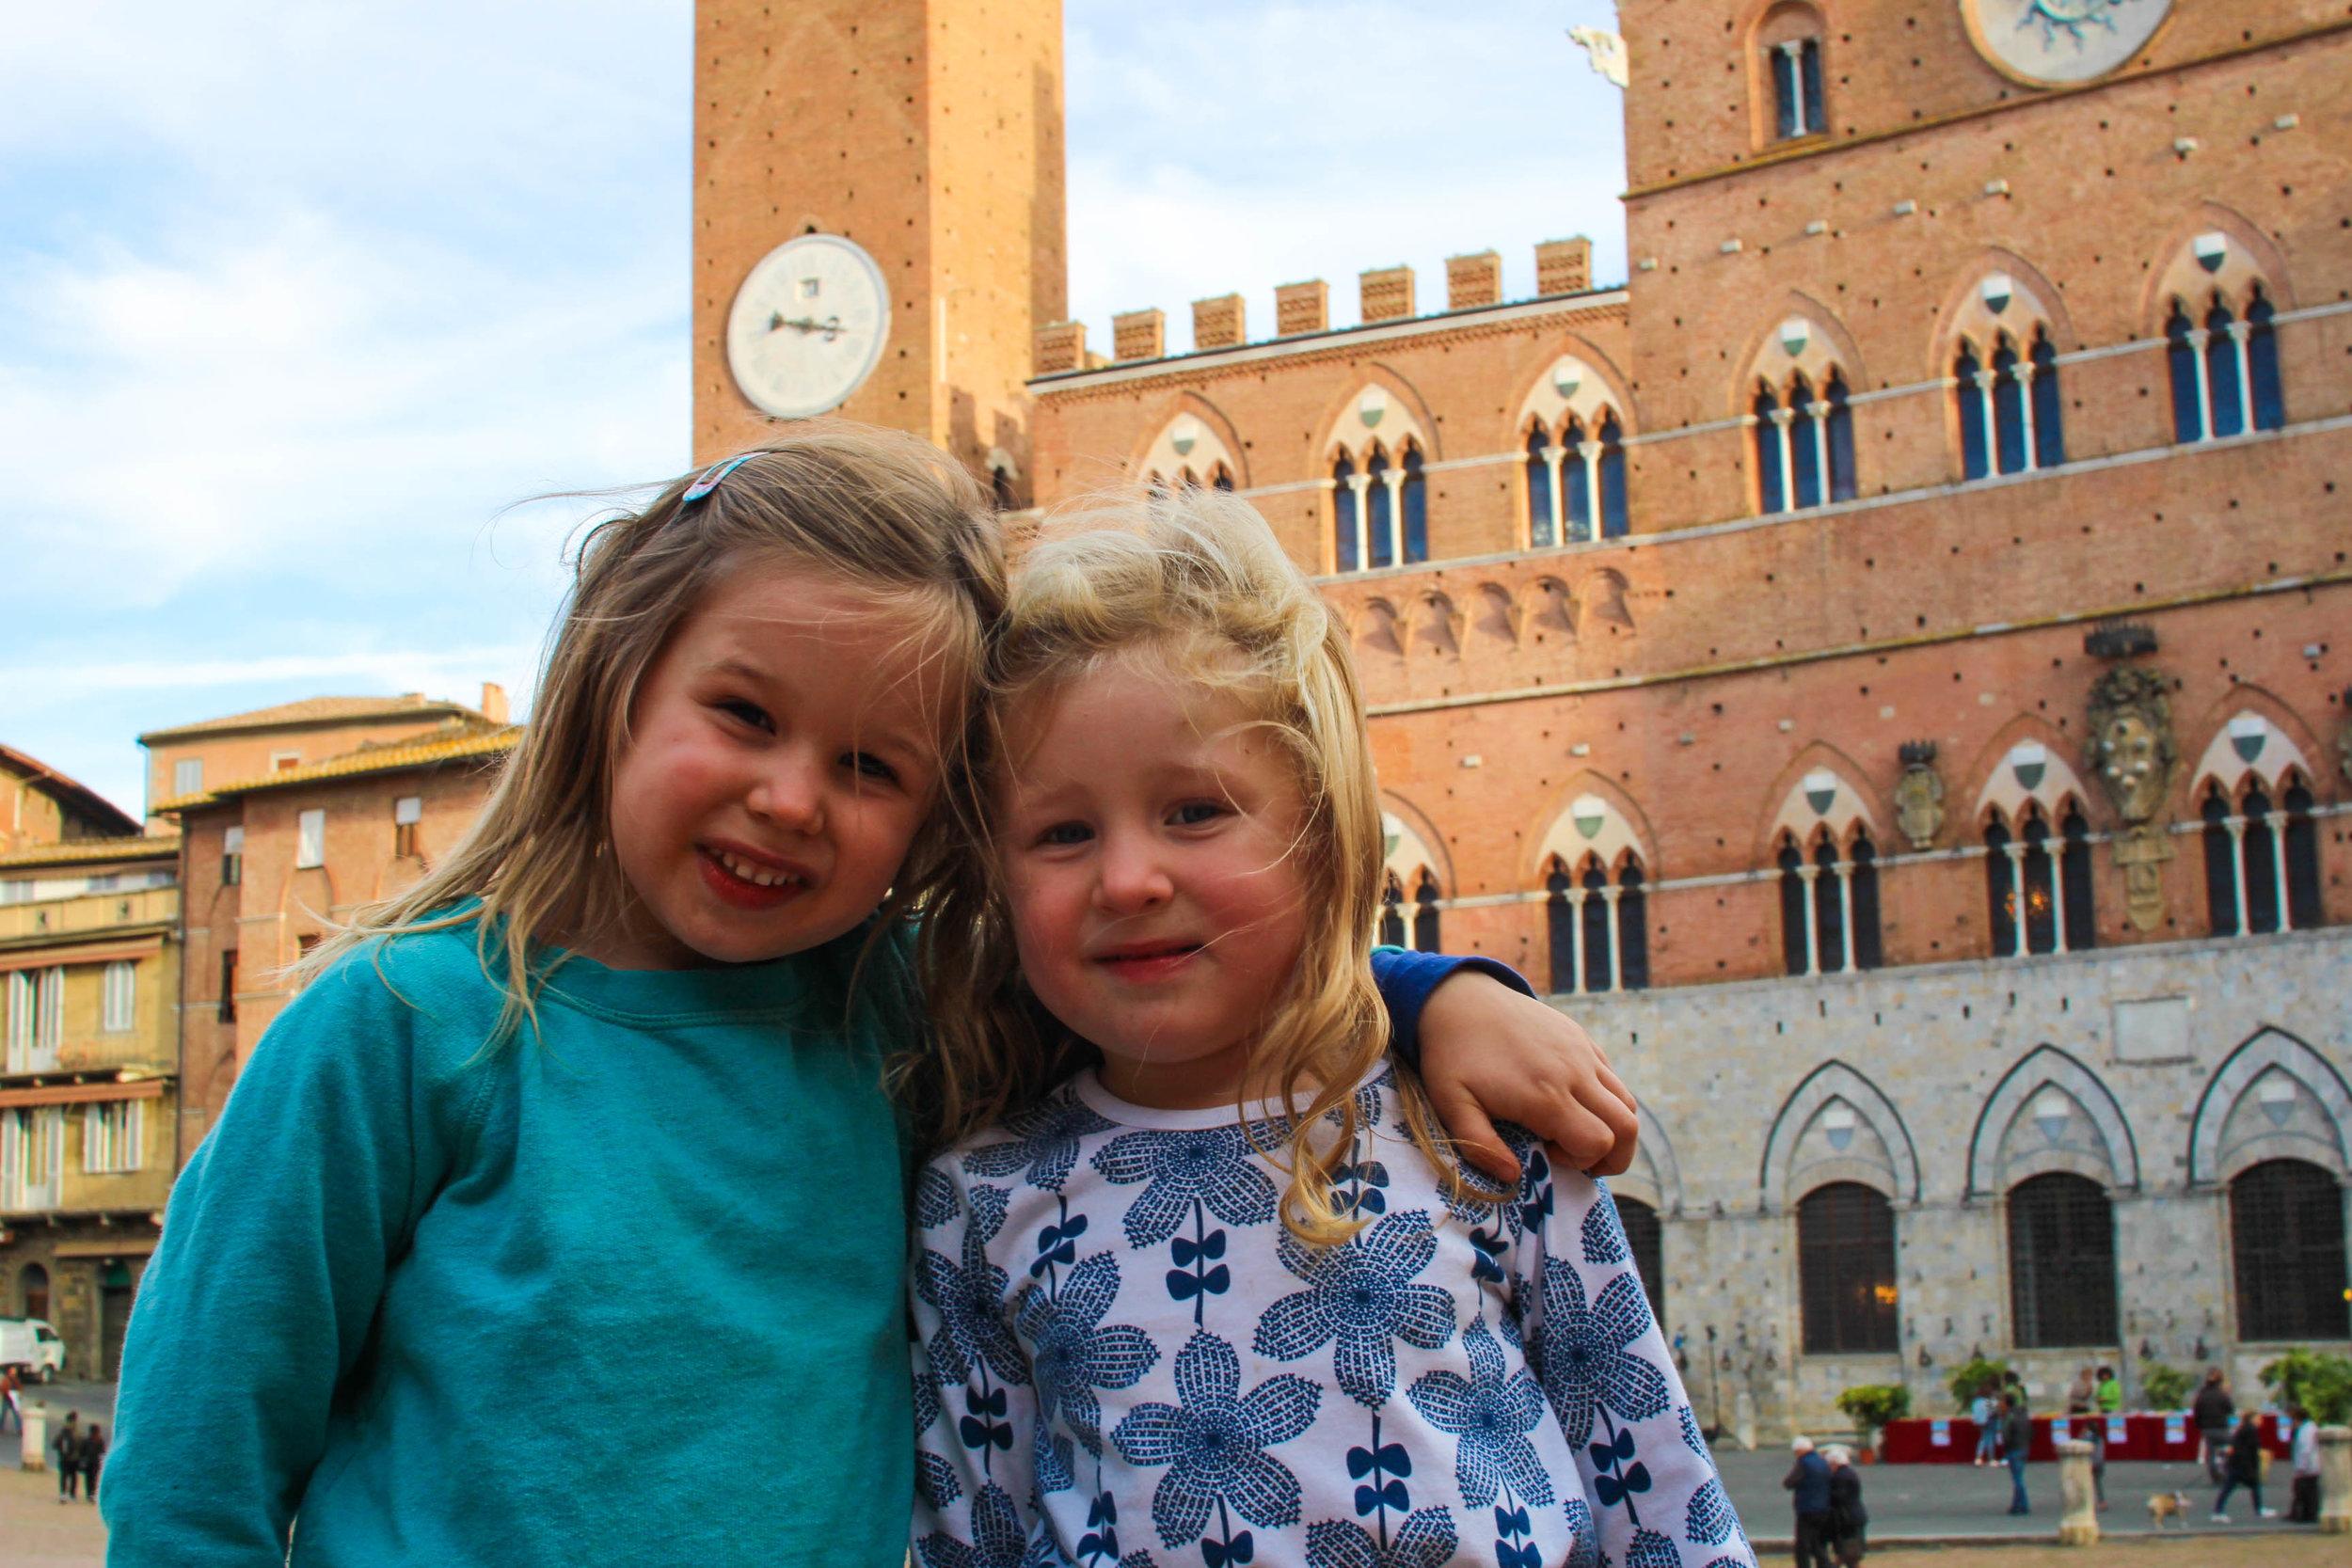 Sisters in the Piazza del Campo, Siena